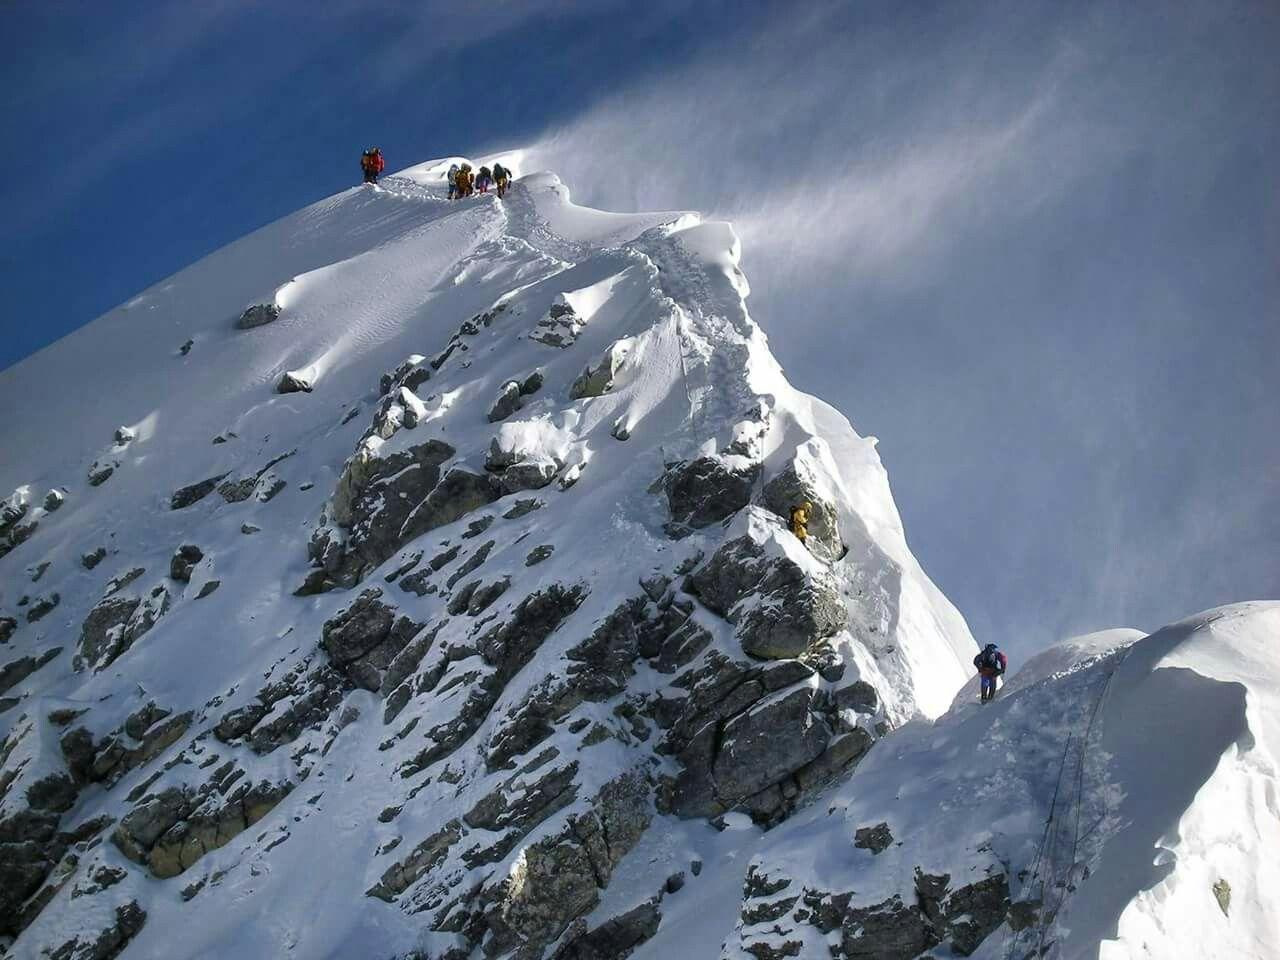 Pin by Rupesh Shahi on green! Mount everest, Everest